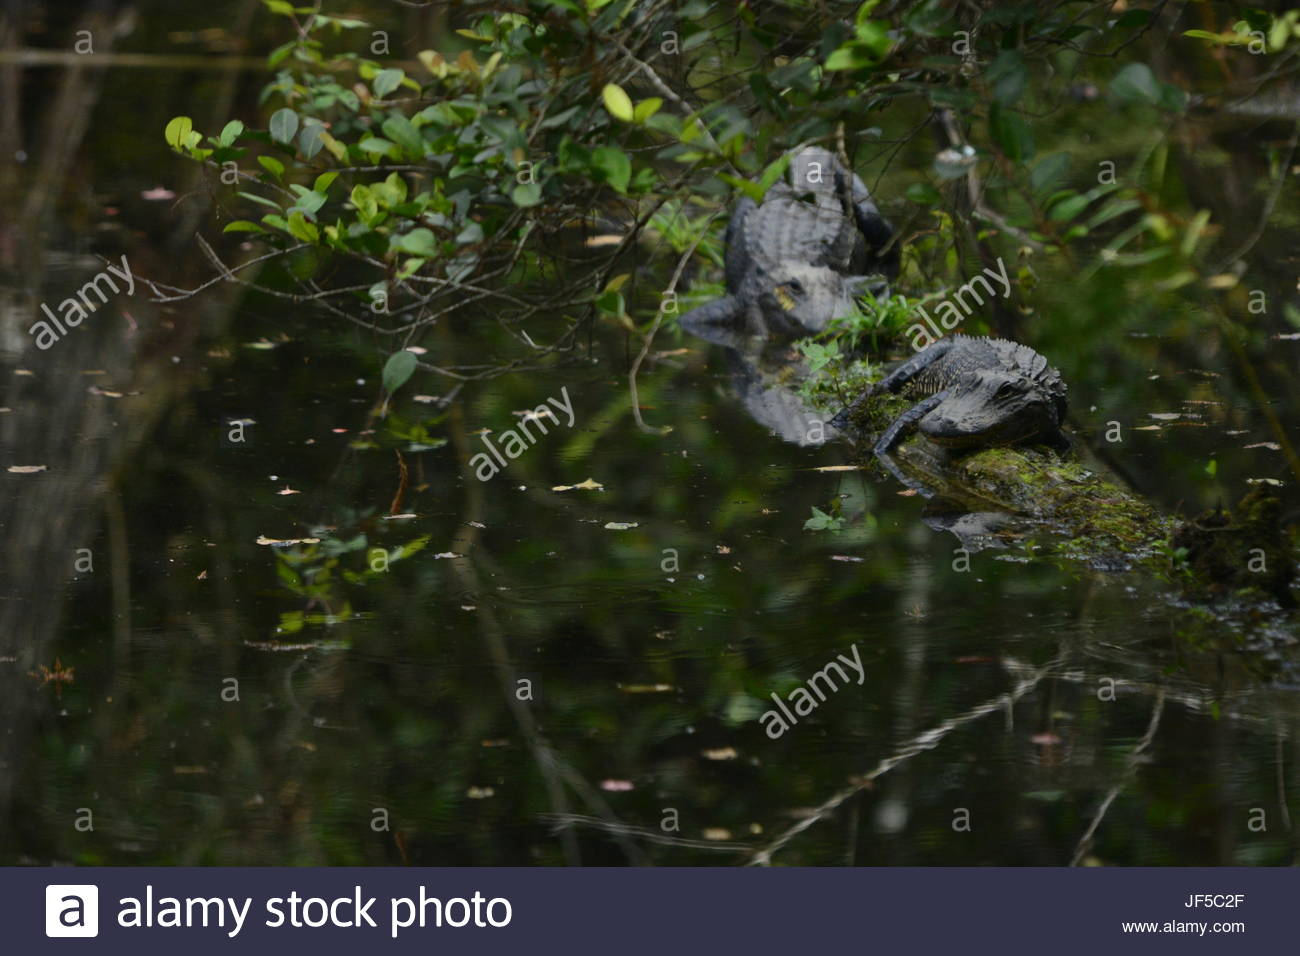 American alligators in wetland. - Stock Image